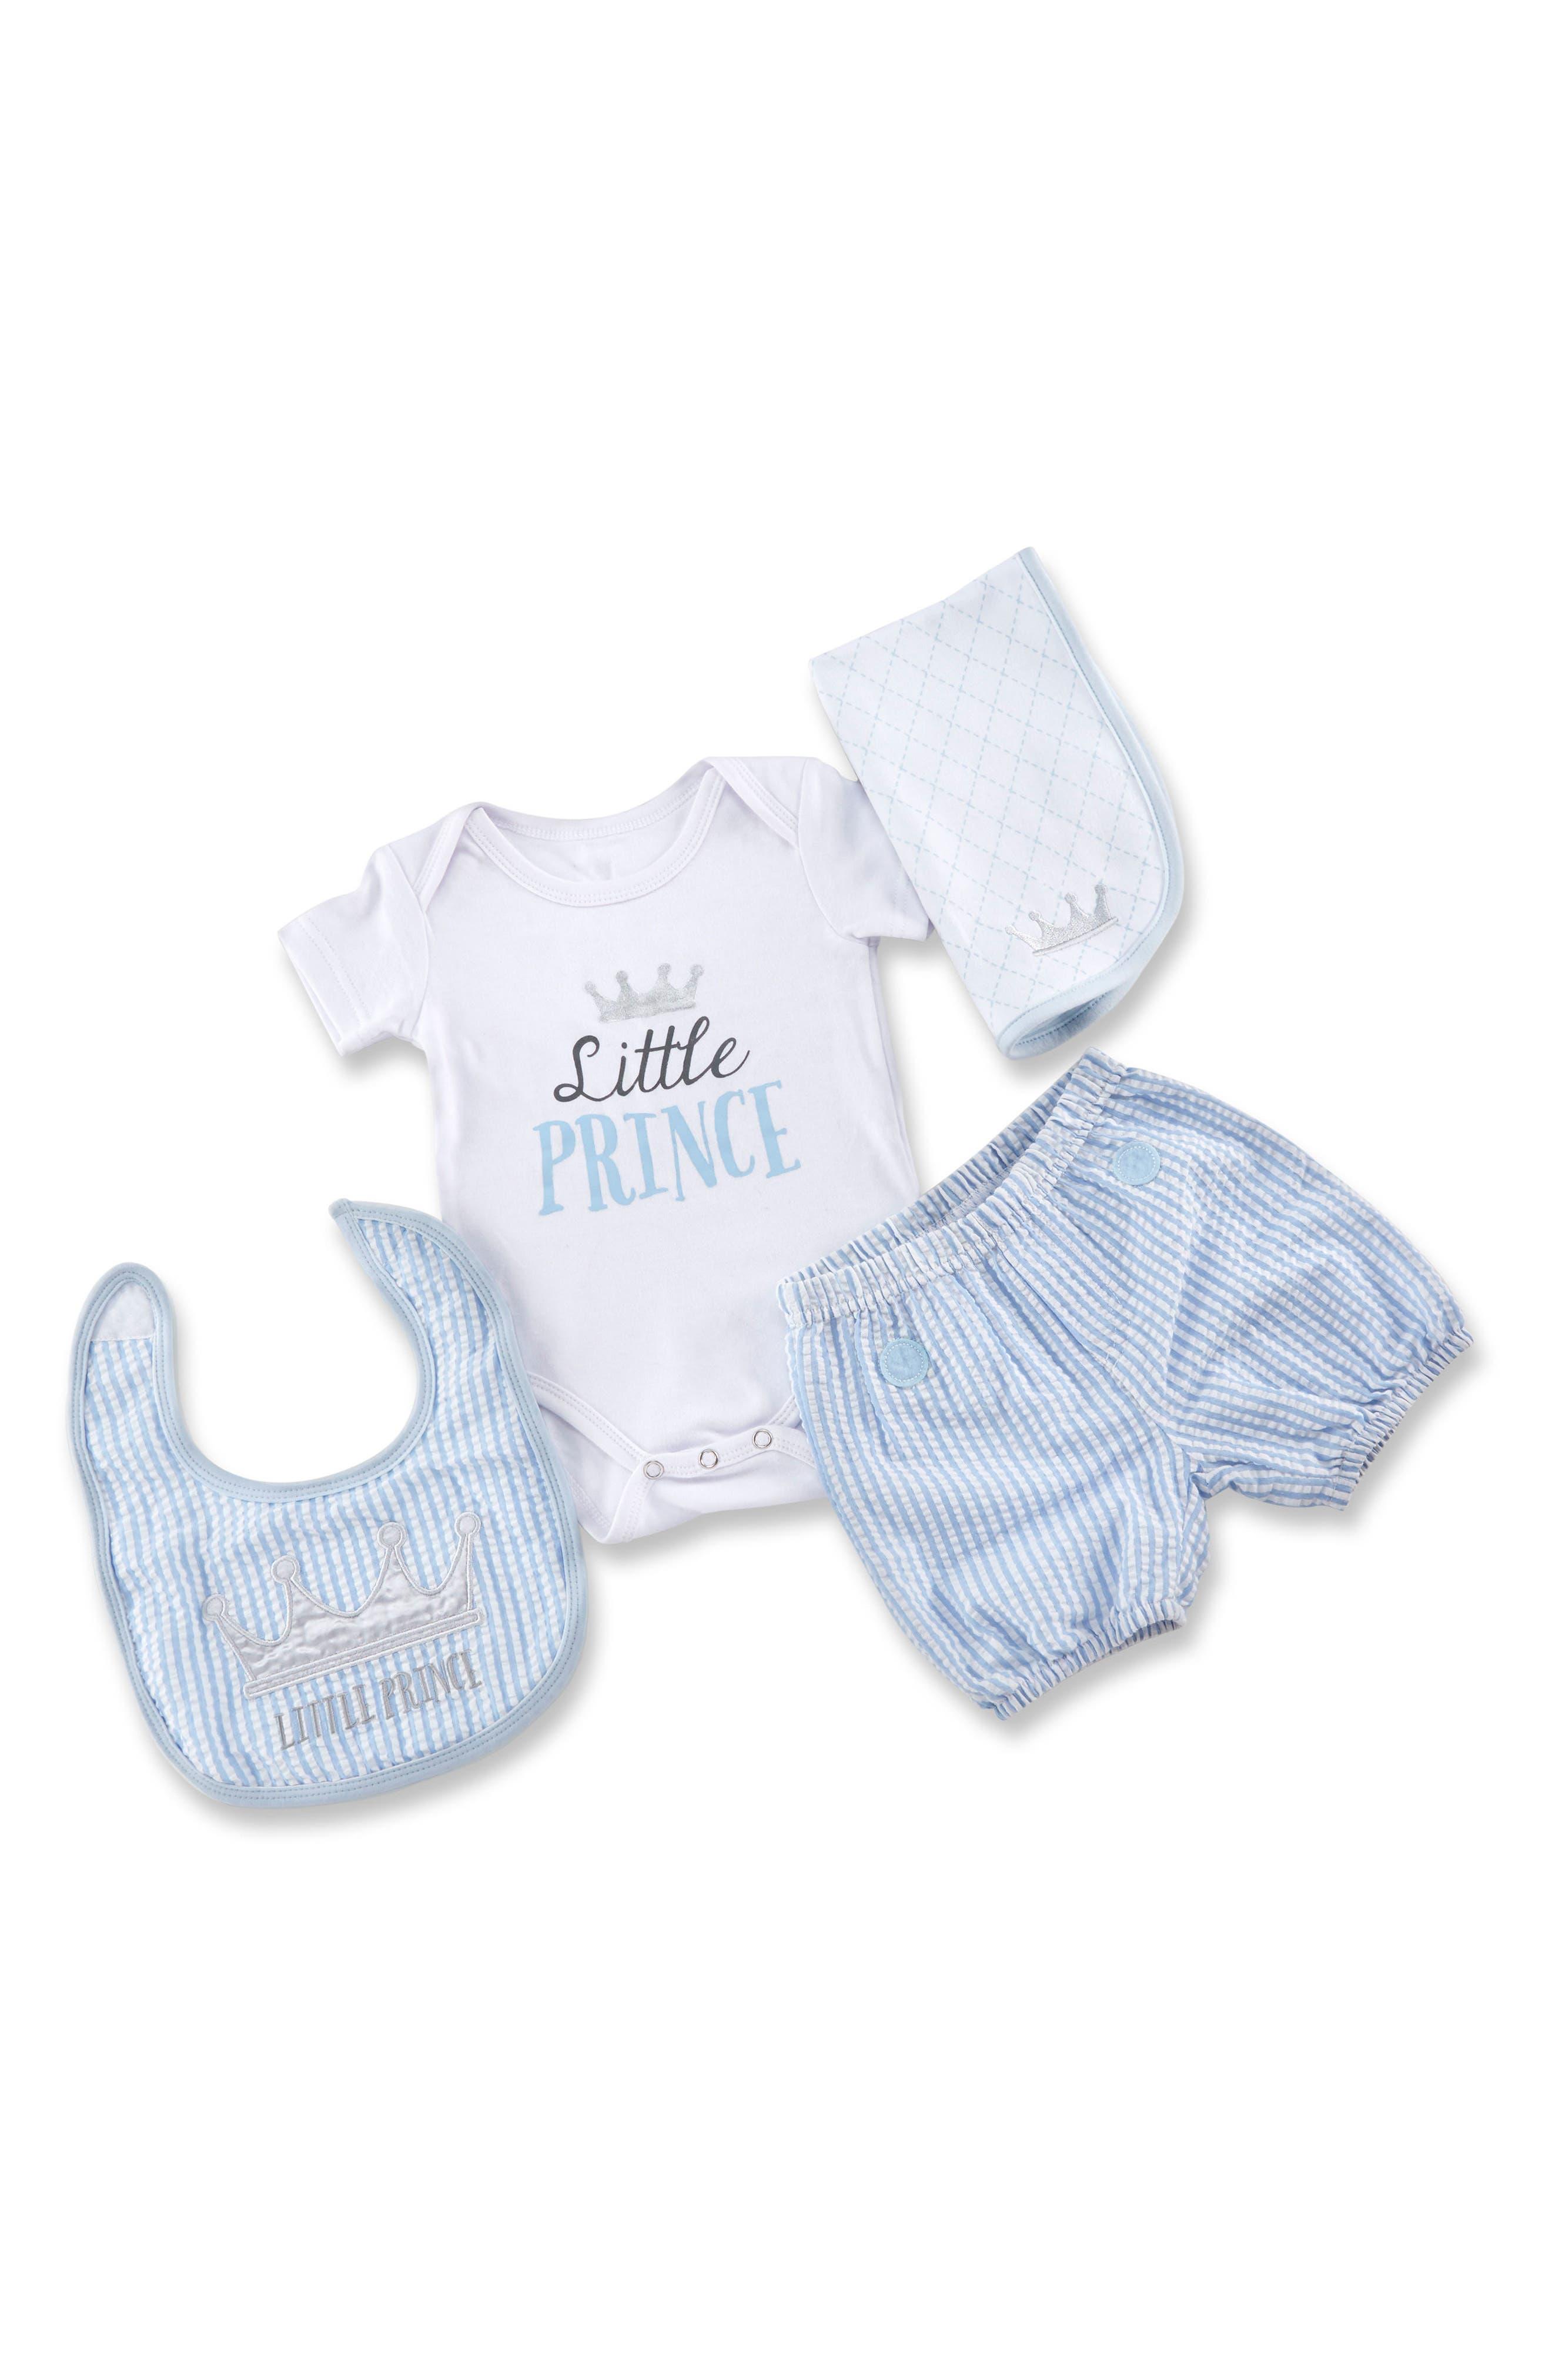 Main Image - Baby Aspen Little Prince Gift Set (Baby Boys)